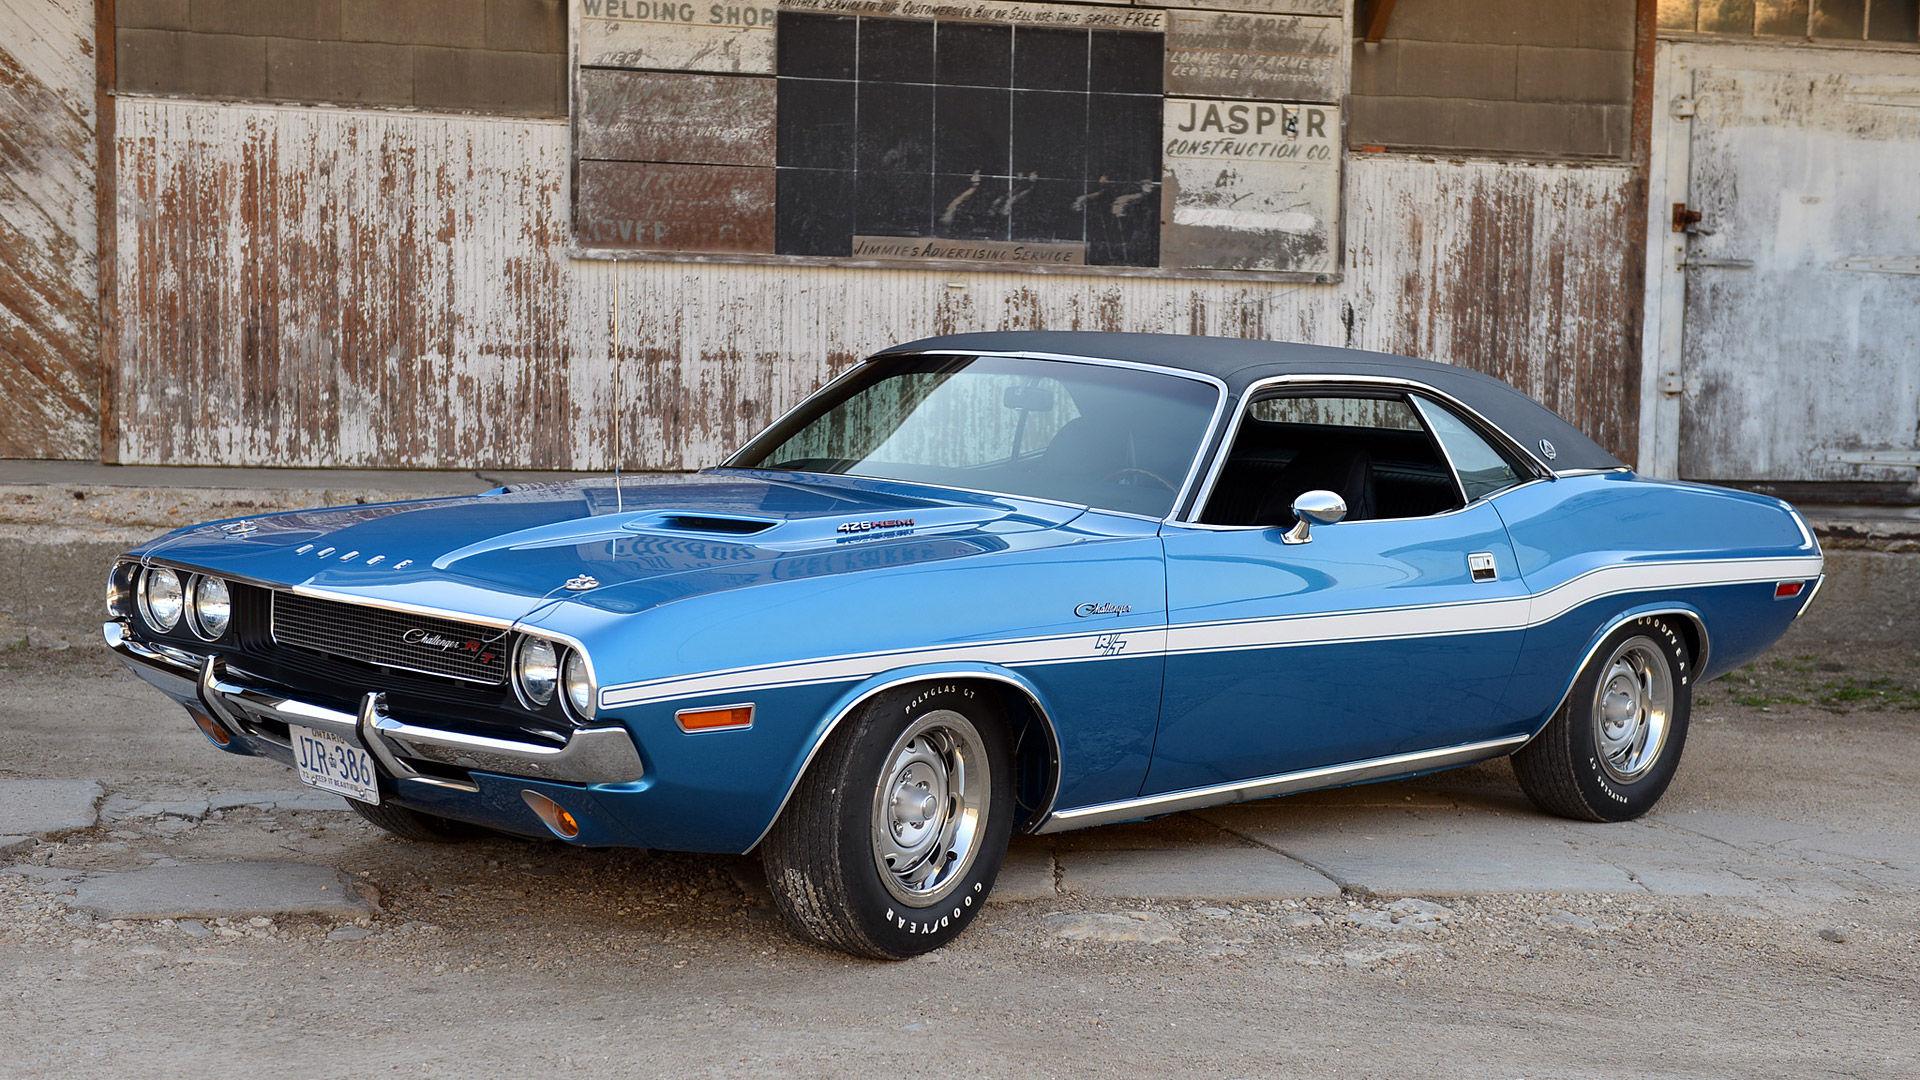 1970 Dodge Challenger R T Se Specs Wallpaper